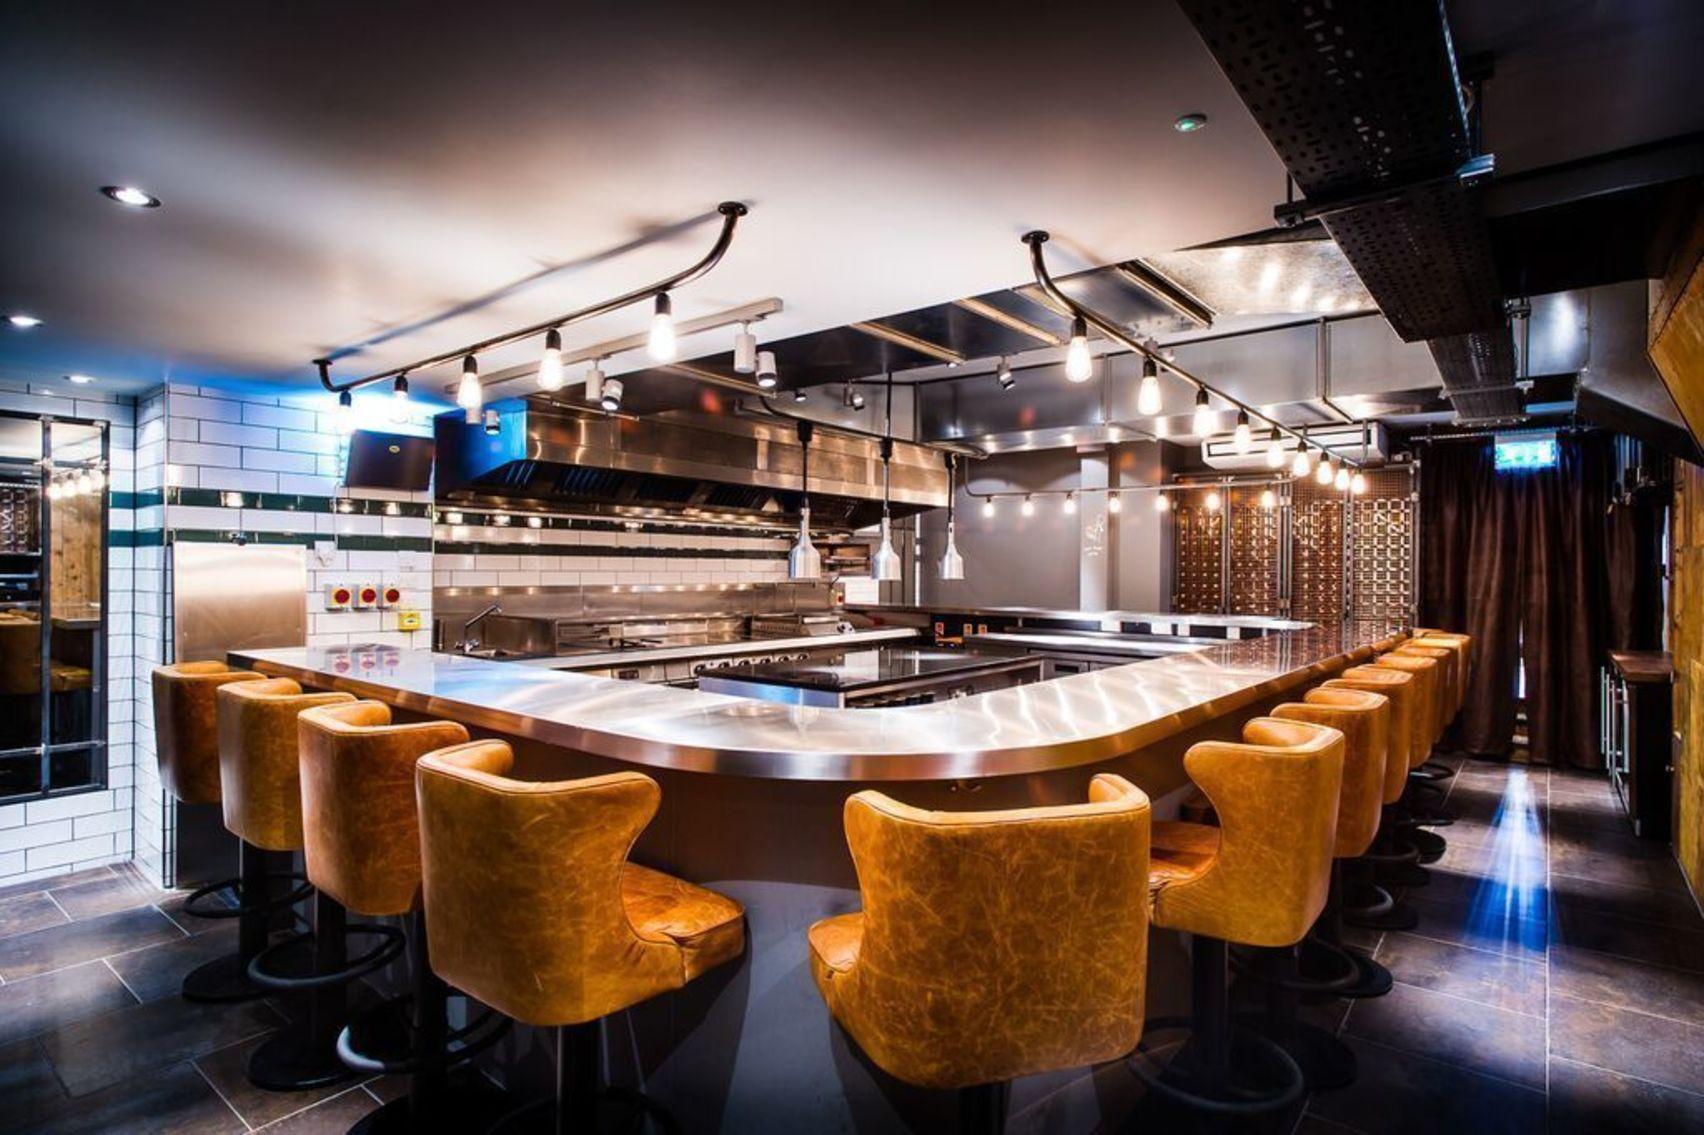 Exclusive Venue Hire, Evening hire, Kitchen Table